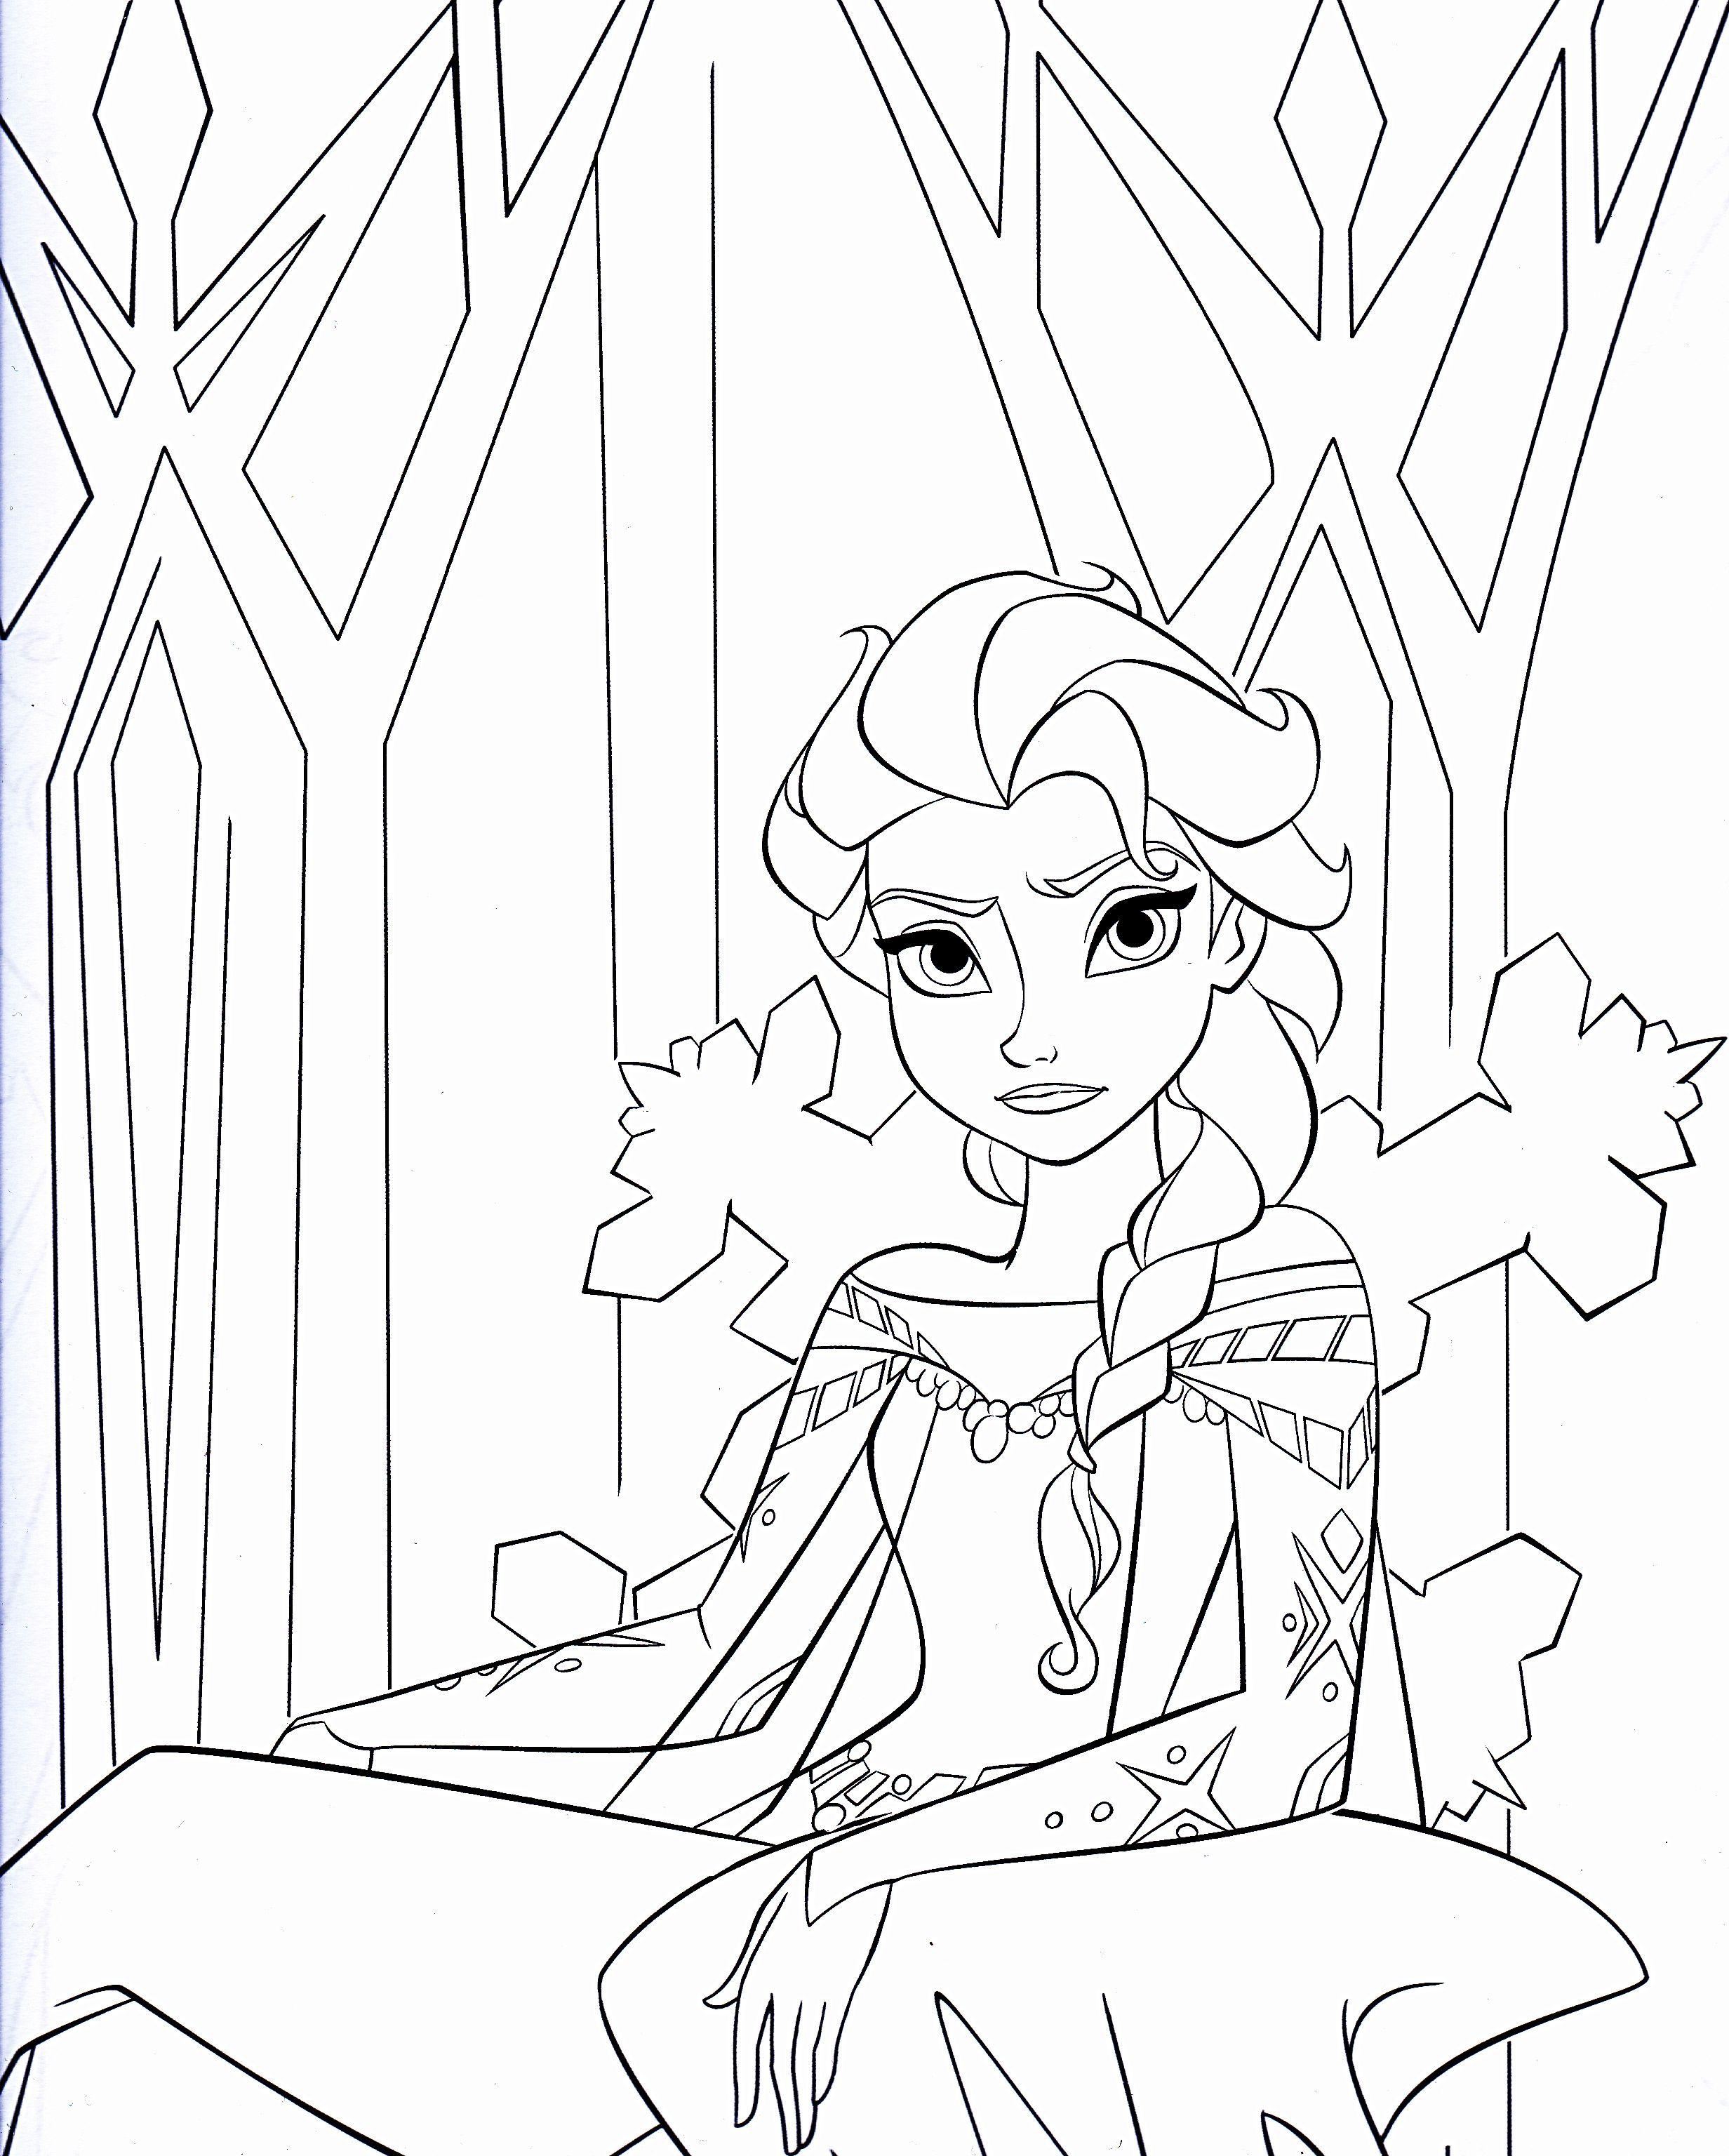 Disney Frozen Coloring Pages Walt Disney Coloring Pages Queen